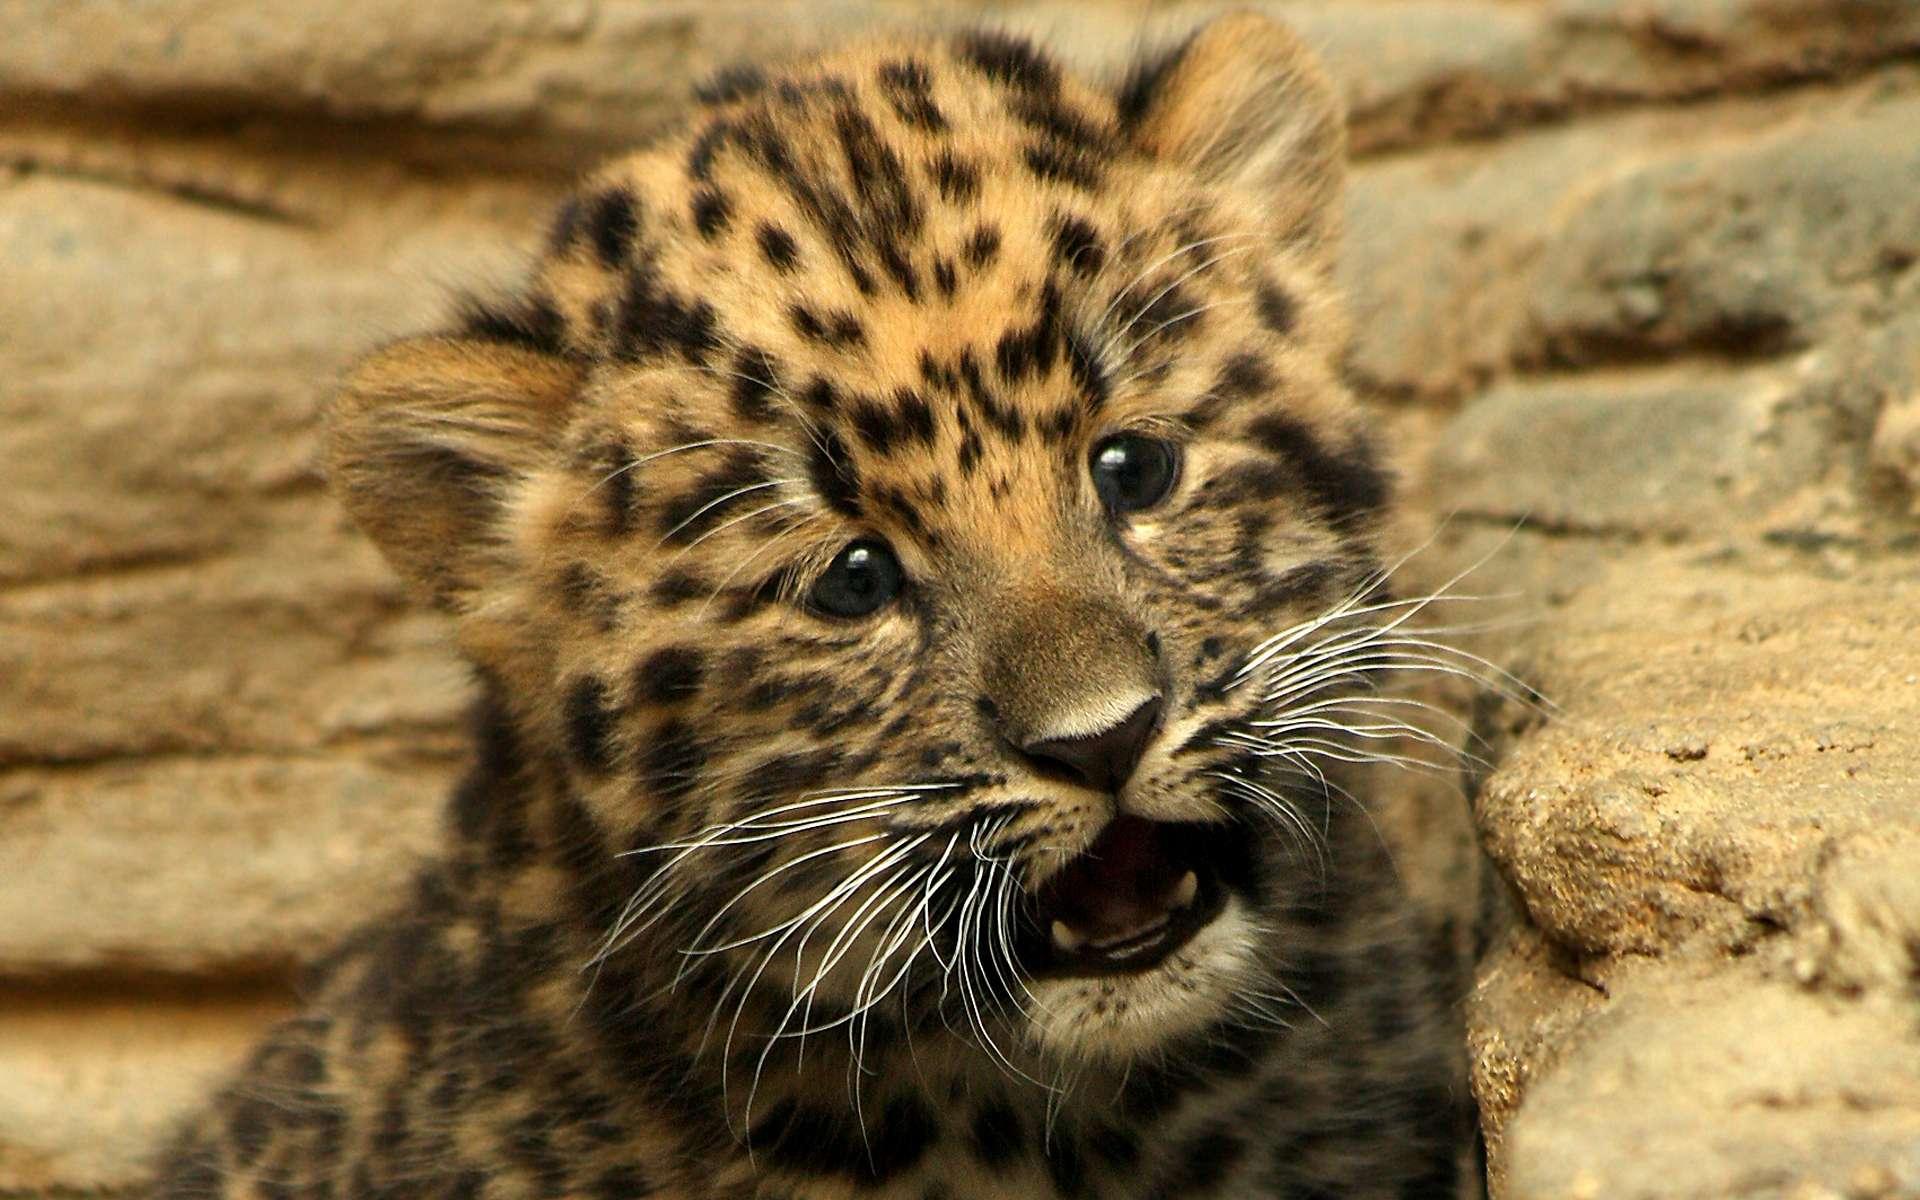 сайте показан картинки на рабочий стол котята леопарда шкафчики, полотенца кроватки